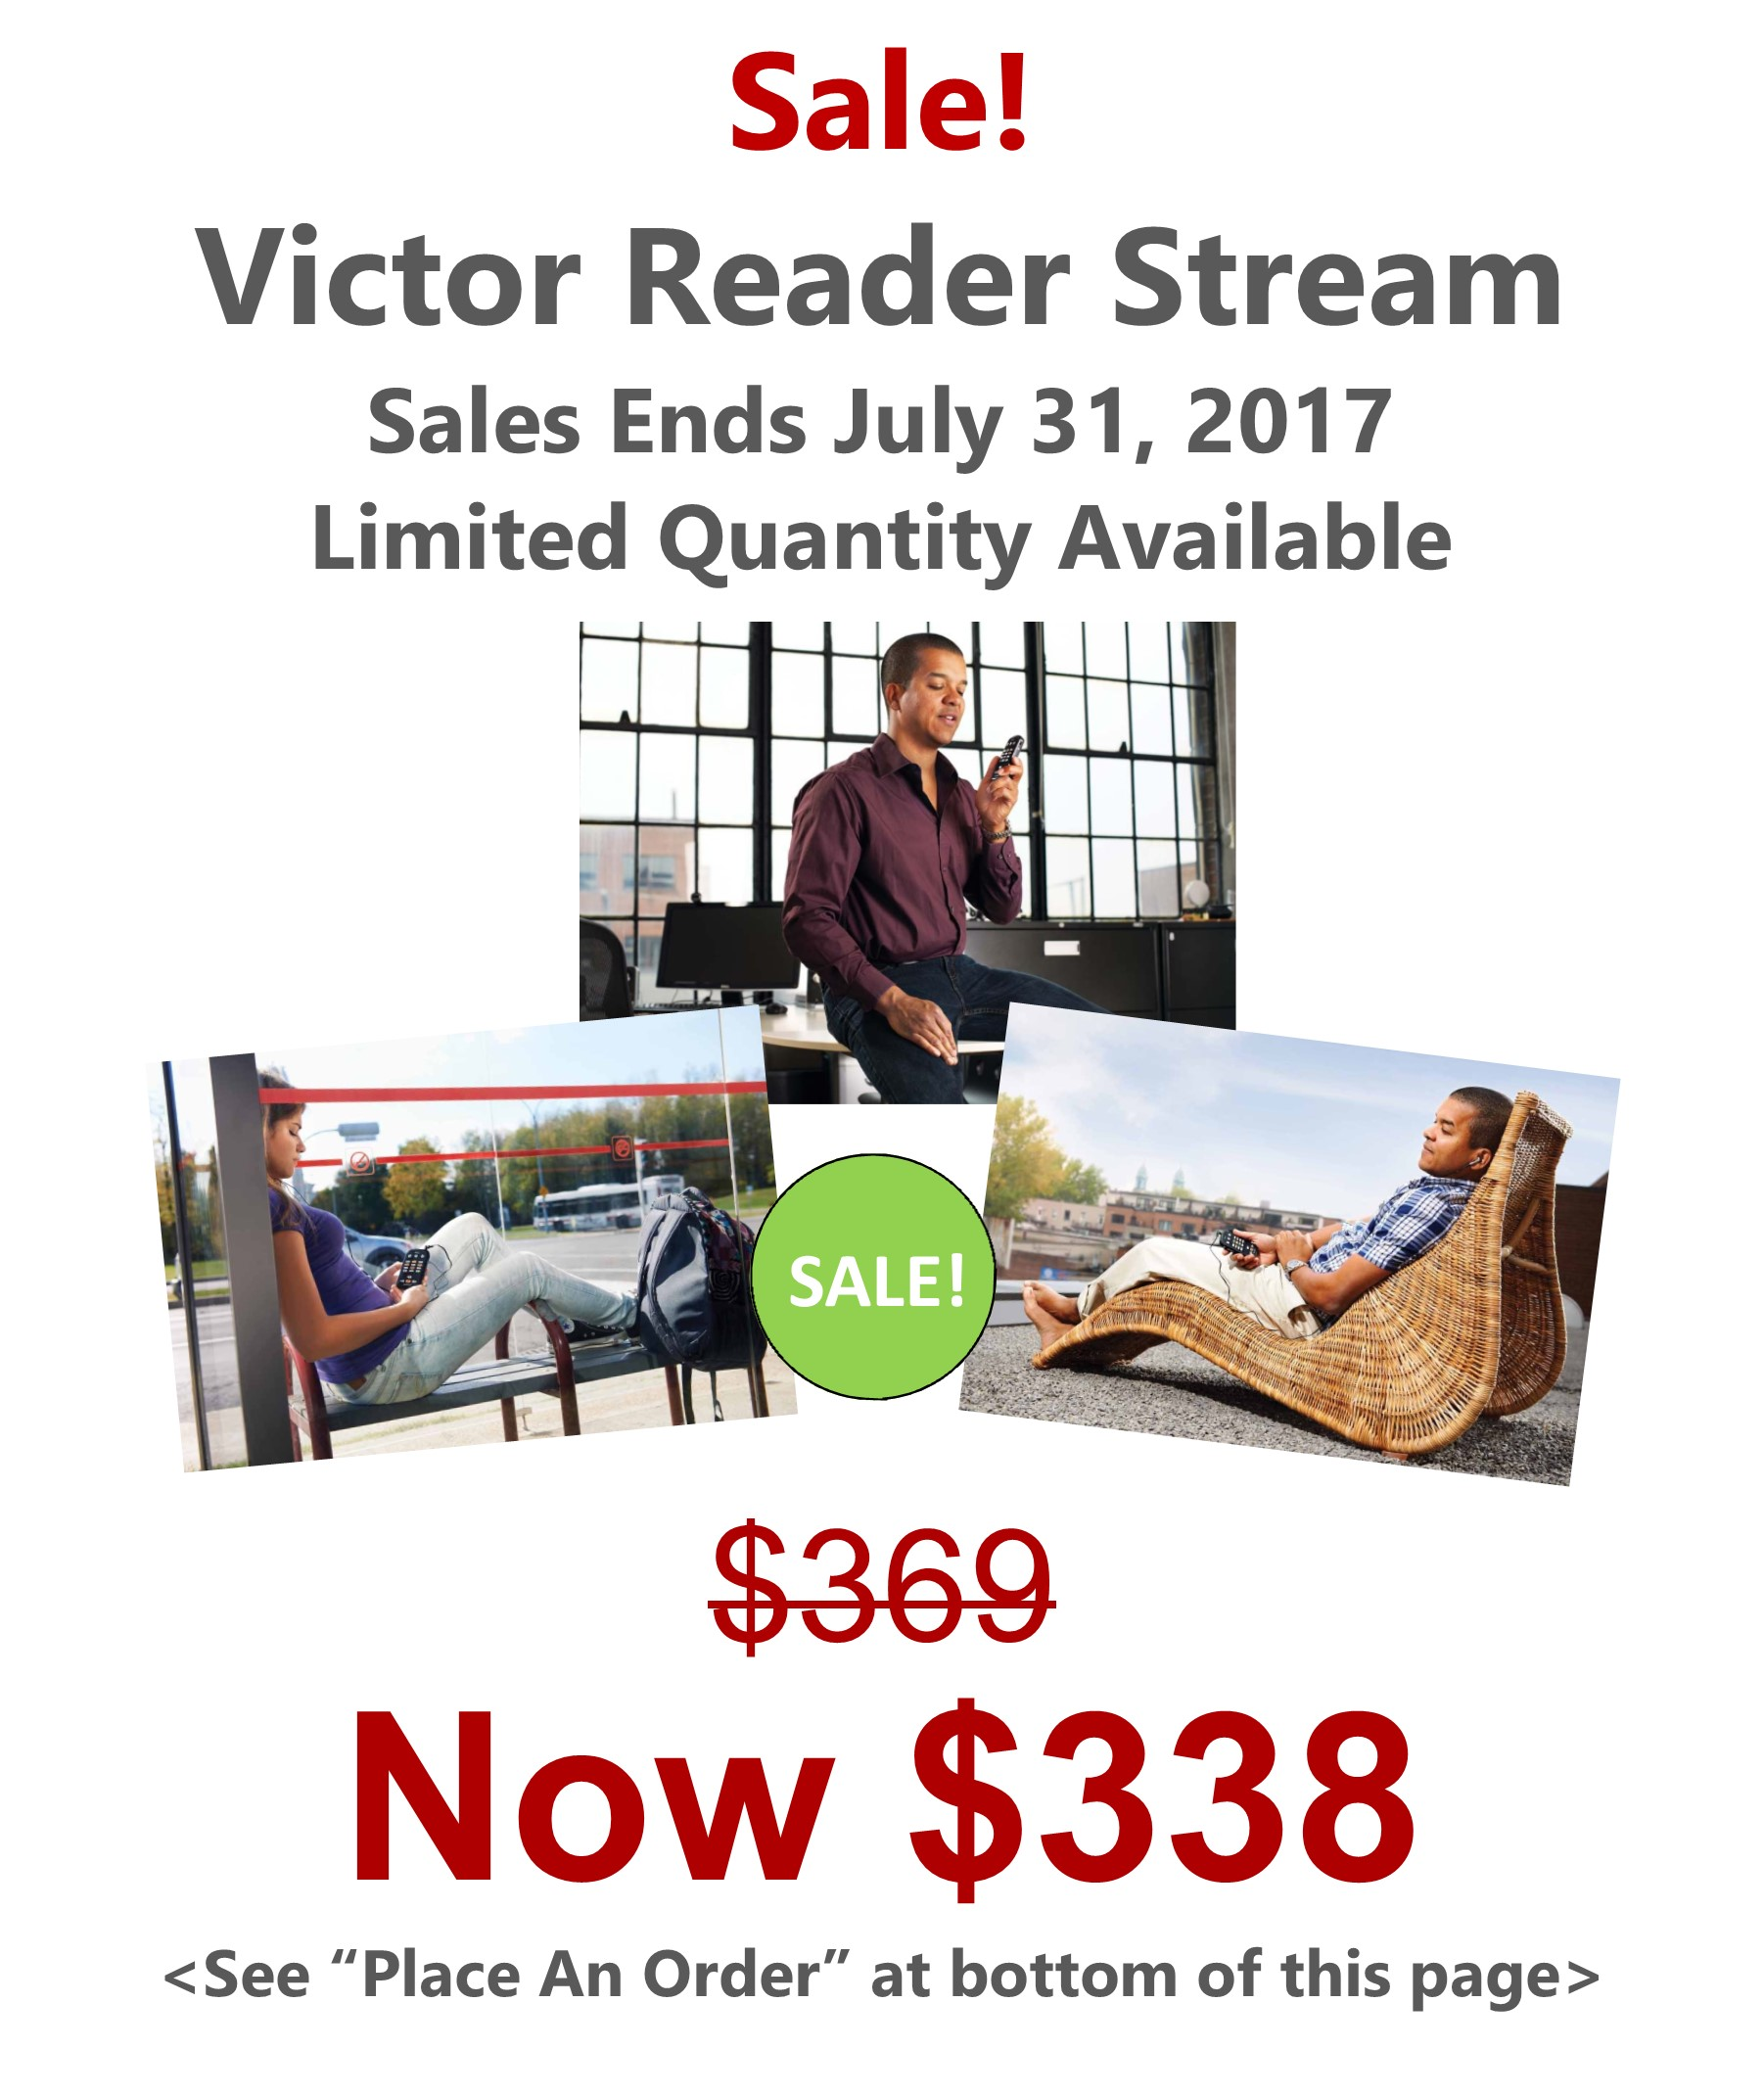 The Reader Stream